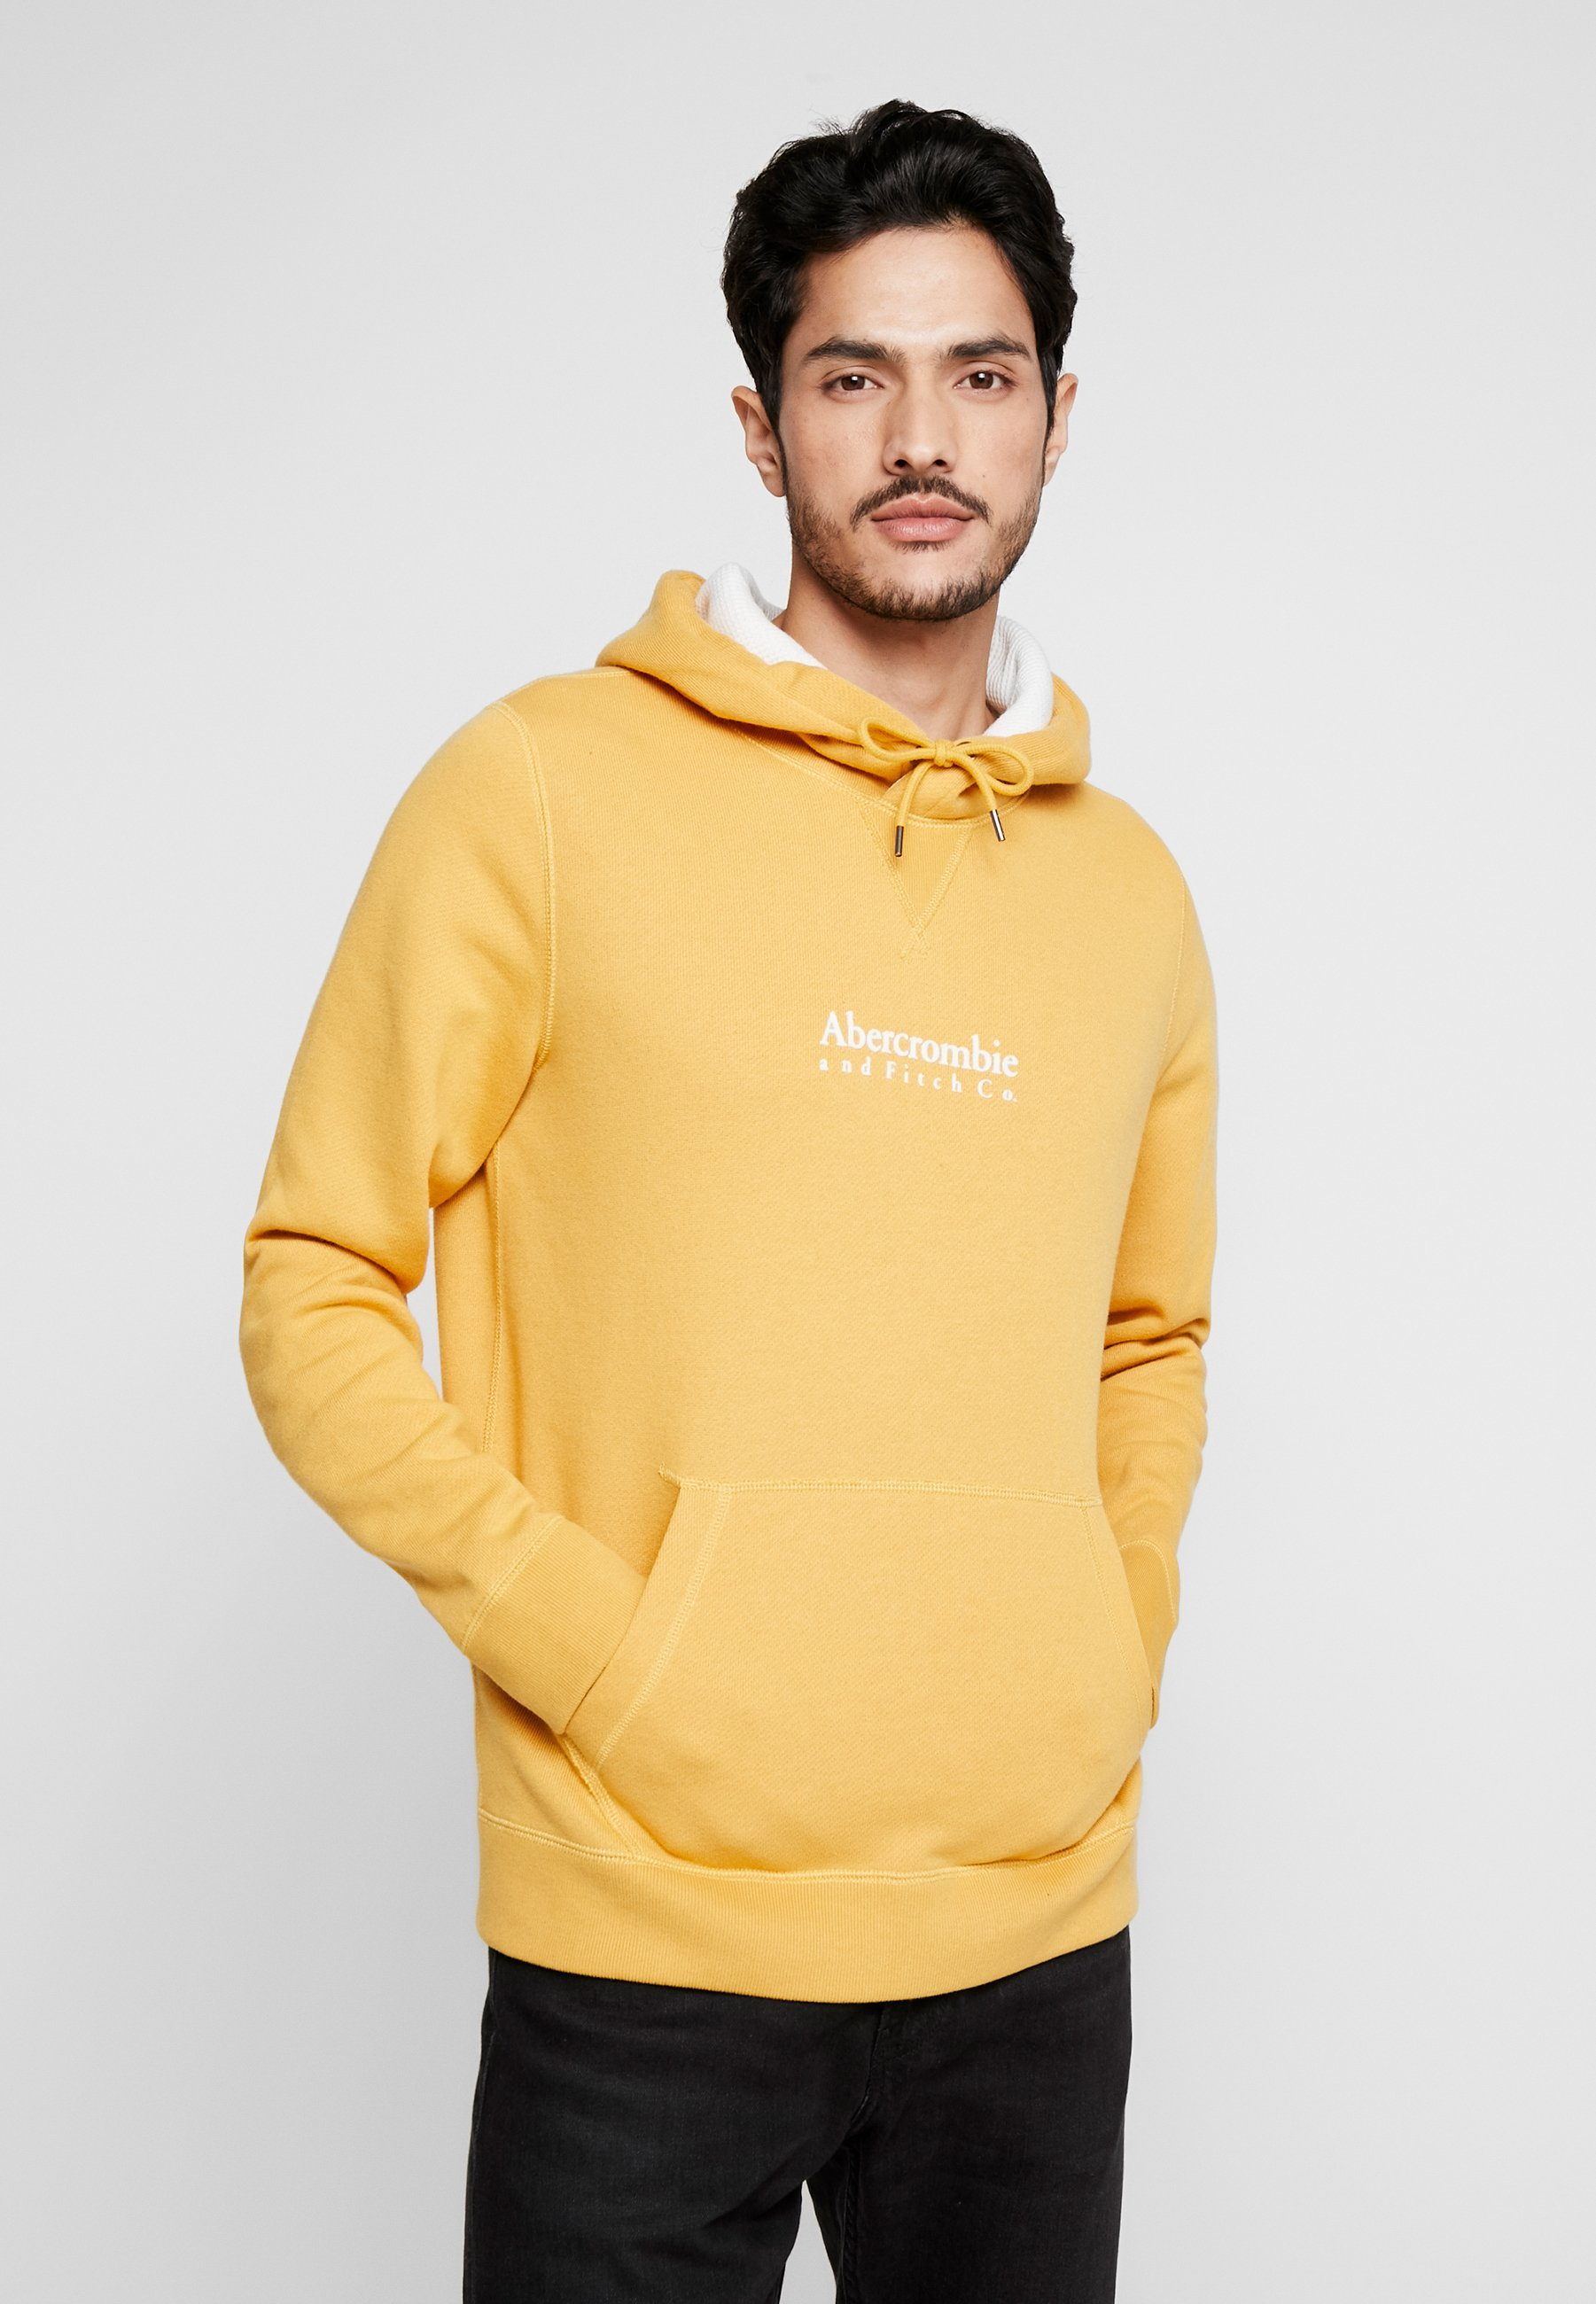 Abercrombie & Fitch FLOCK GARAMOND LOGO POPOVER - Bluza z kapturem - yellow